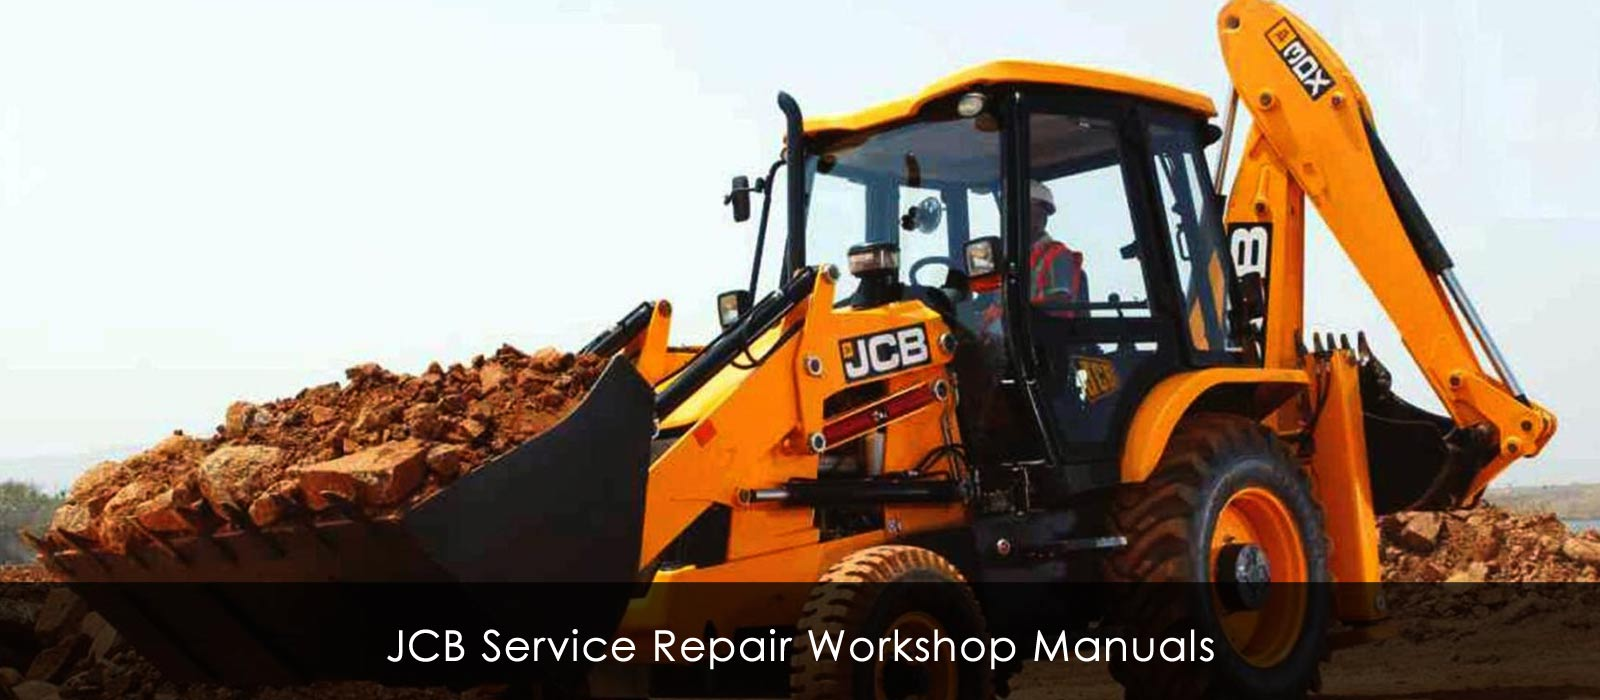 JCB Workshop Manual service online   Big Manuals   USA